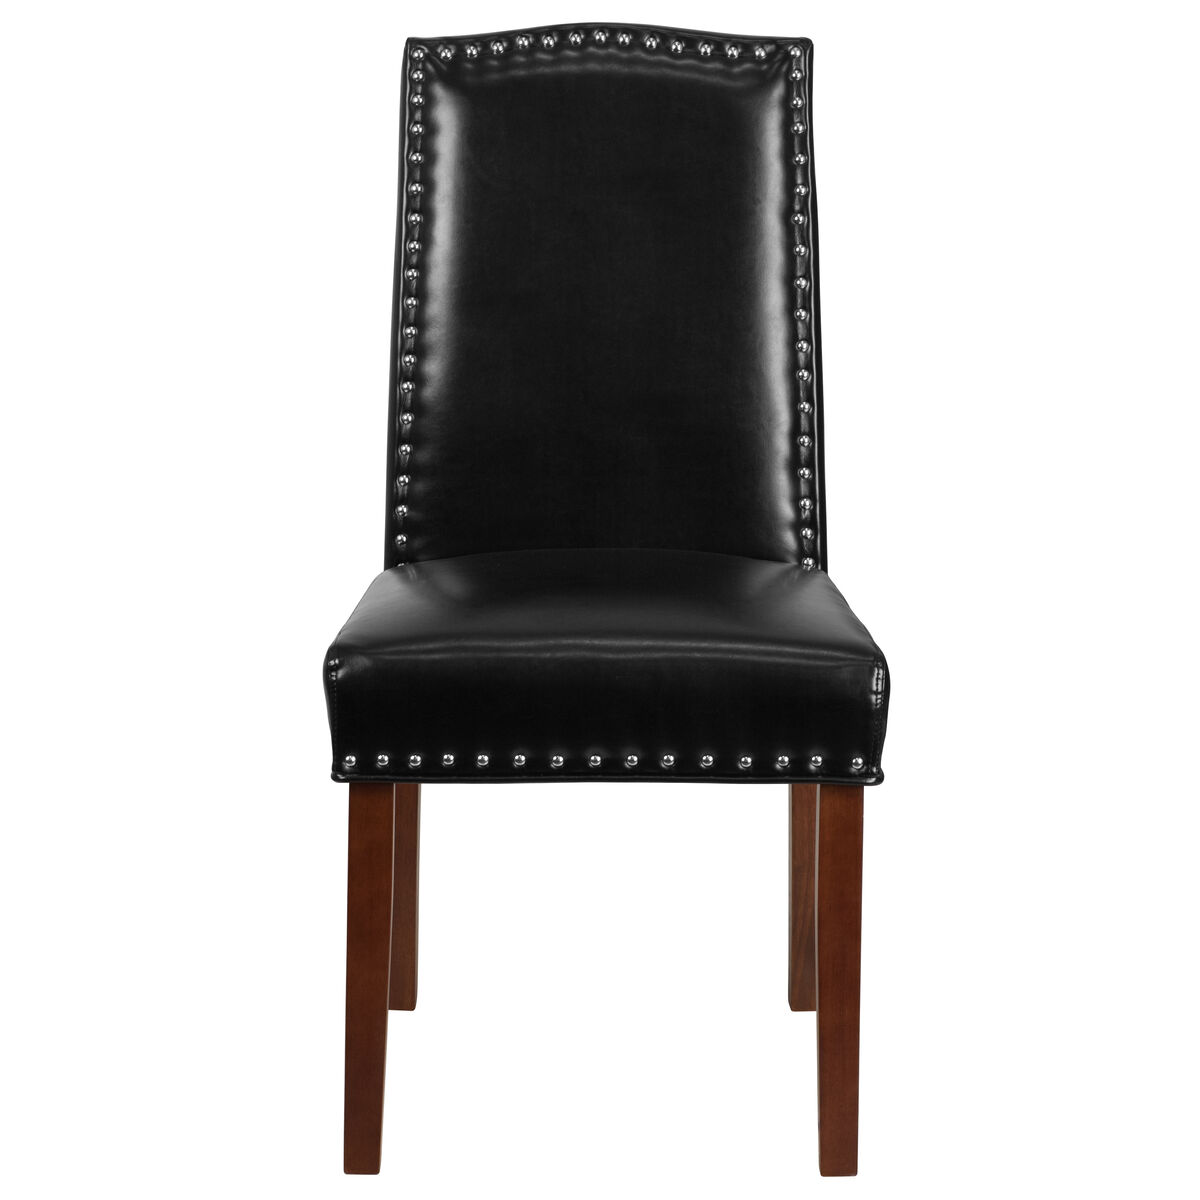 Black Leather Parsons Chair Qy A13 9349 Bk Gg Bizchair Com